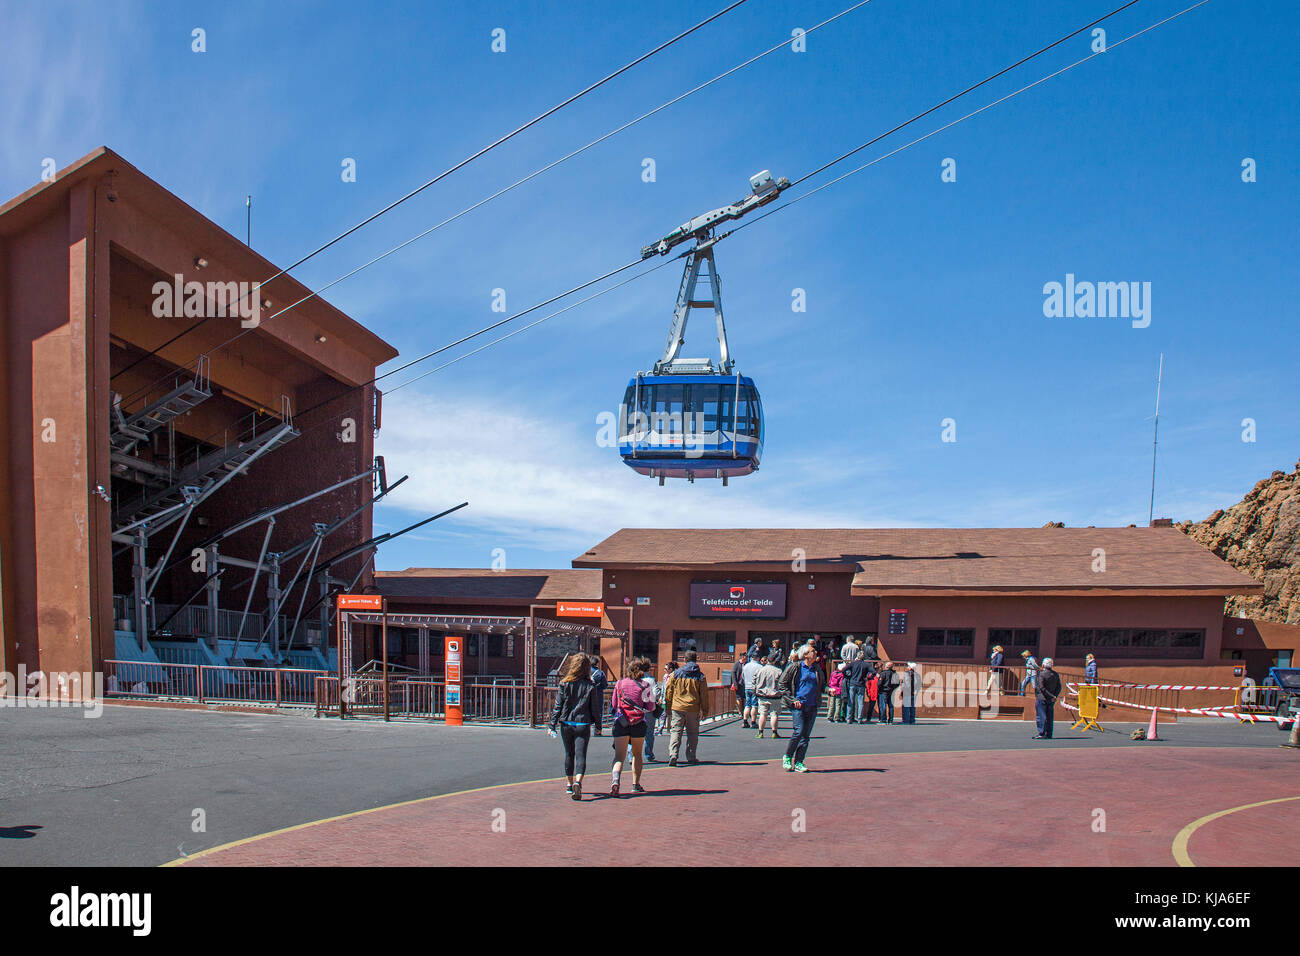 Teide-Seilbahnstation (Teleferico de Teide), cable car to Teide, Tenerife island, Canary islands, Spain - Stock Image